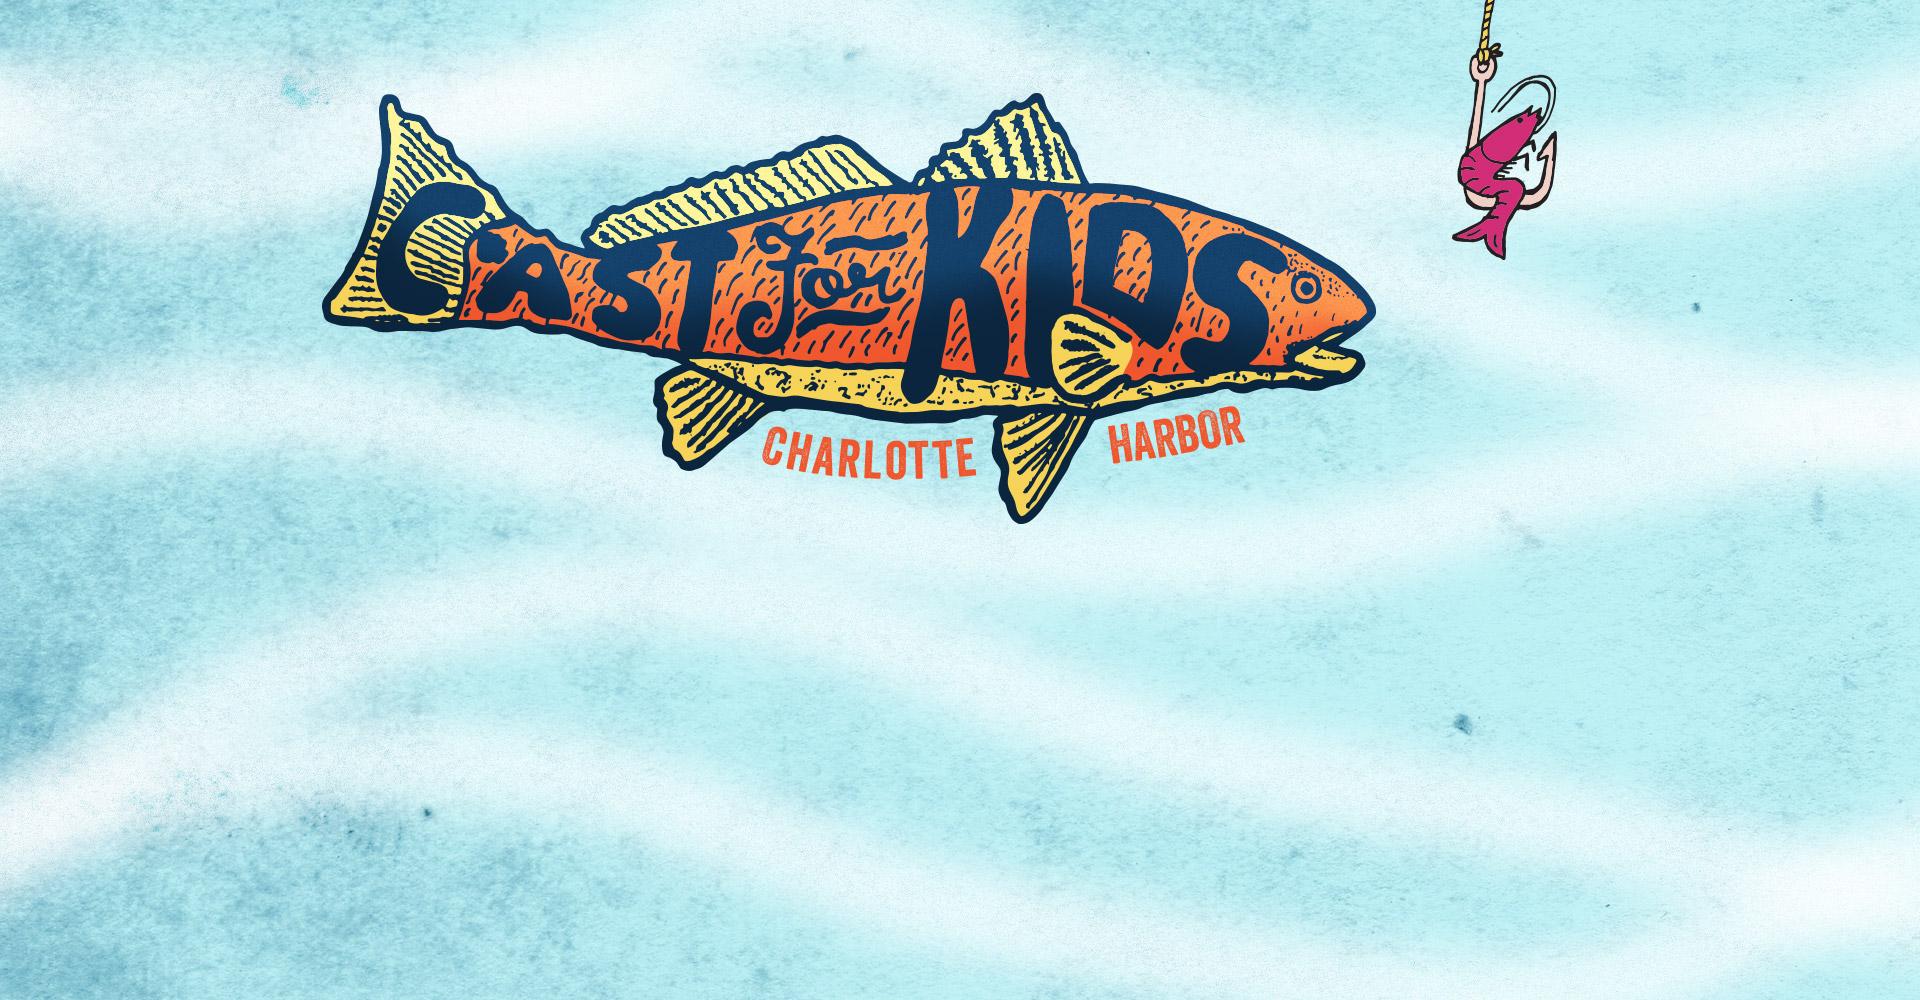 C.A.S.T. for Kids – Charlotte Harbor (FL)